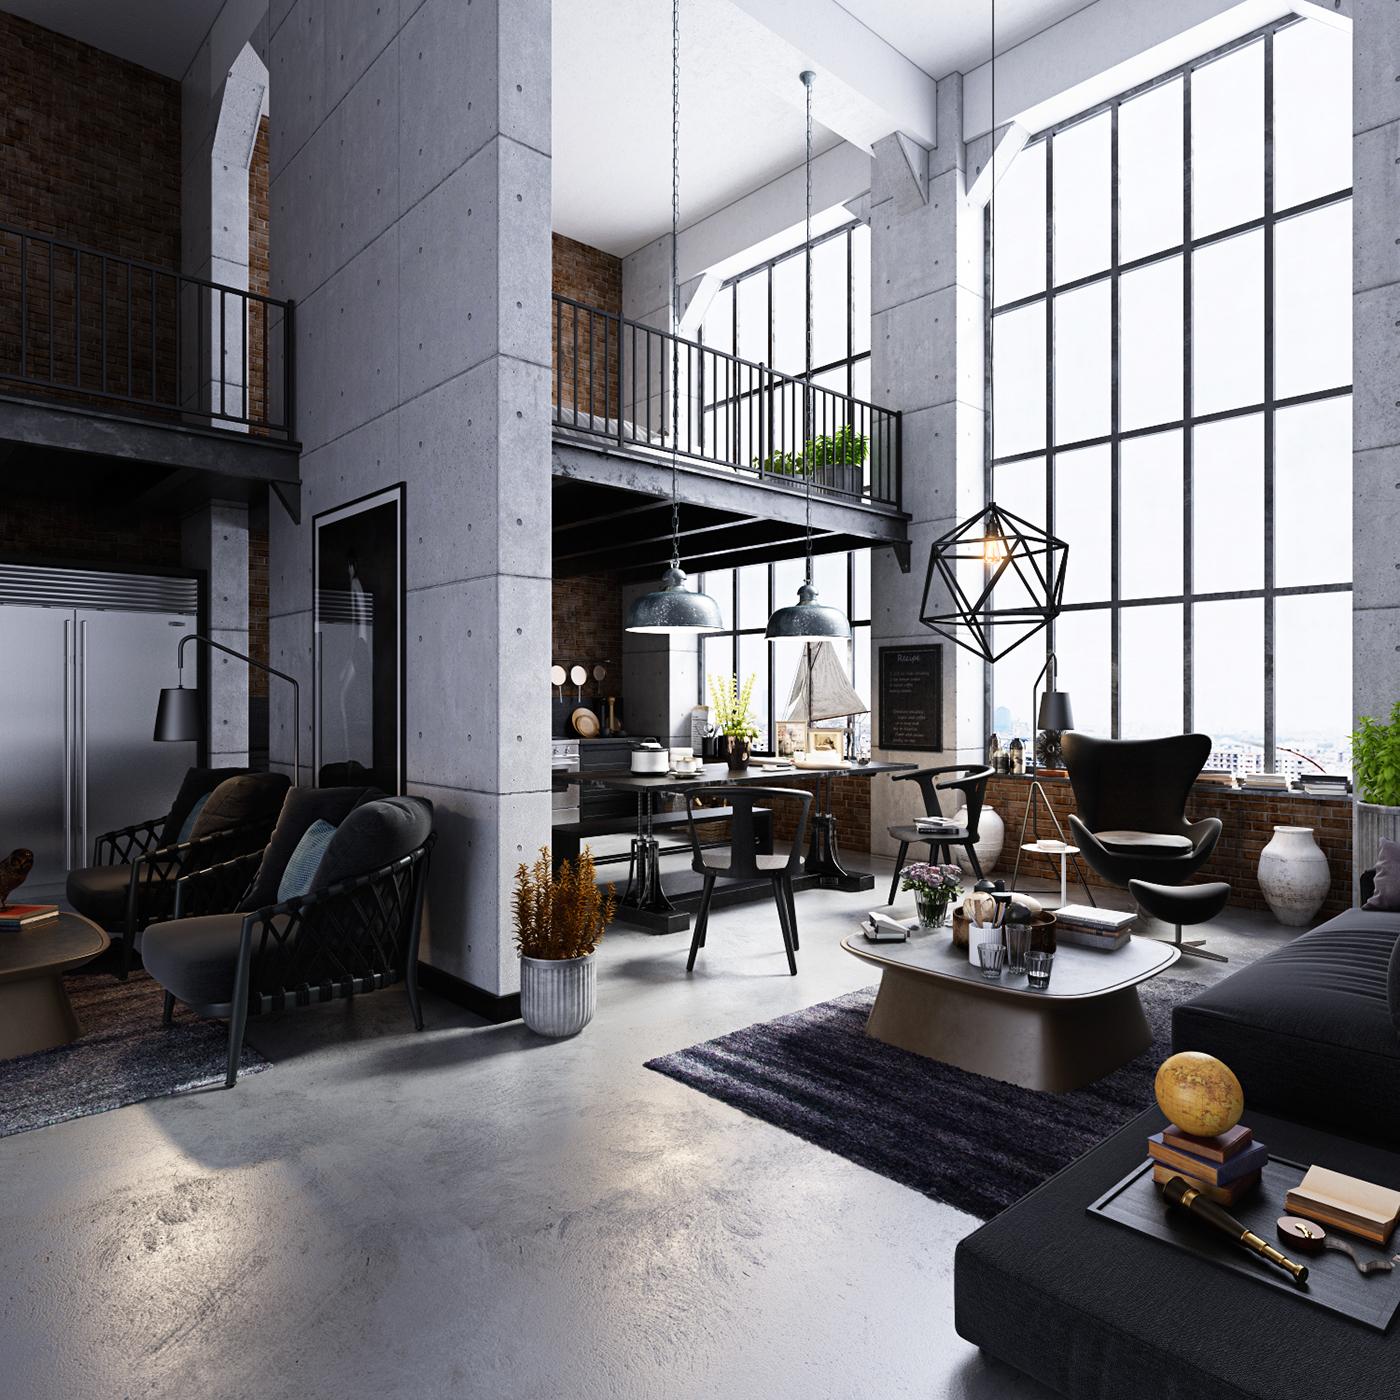 Studio loft apartment on Behance